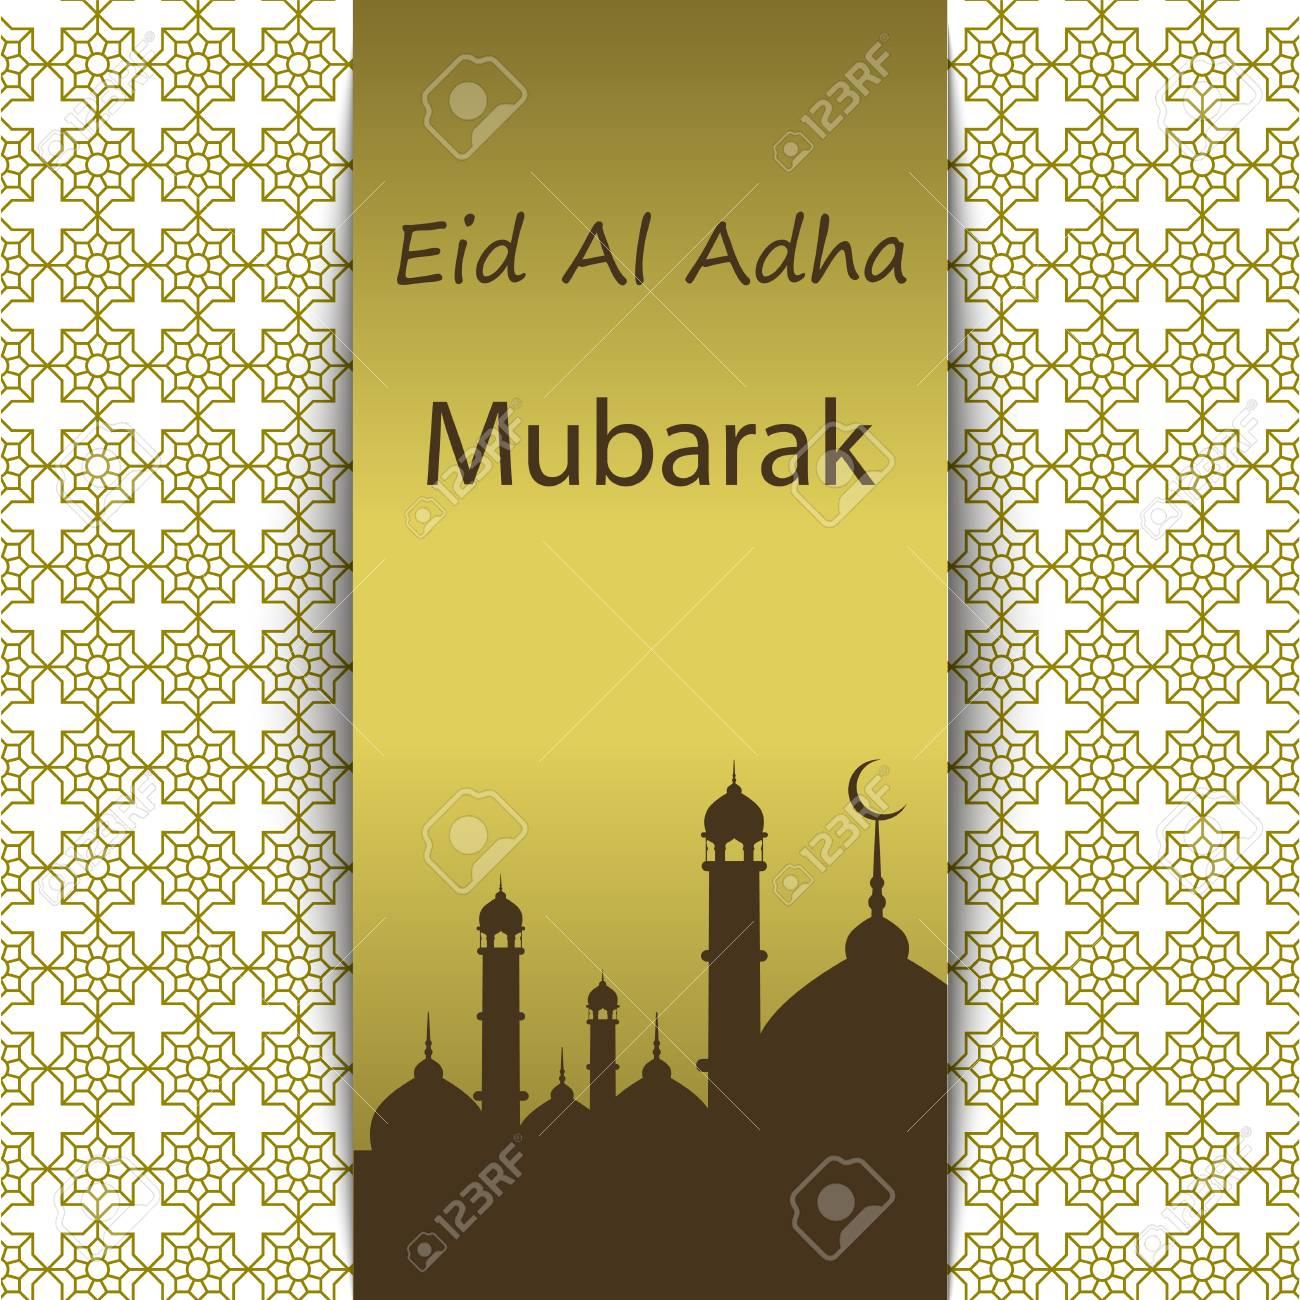 Eid Al Adha Mubarak Greeting Card Royalty Free Cliparts Vectors